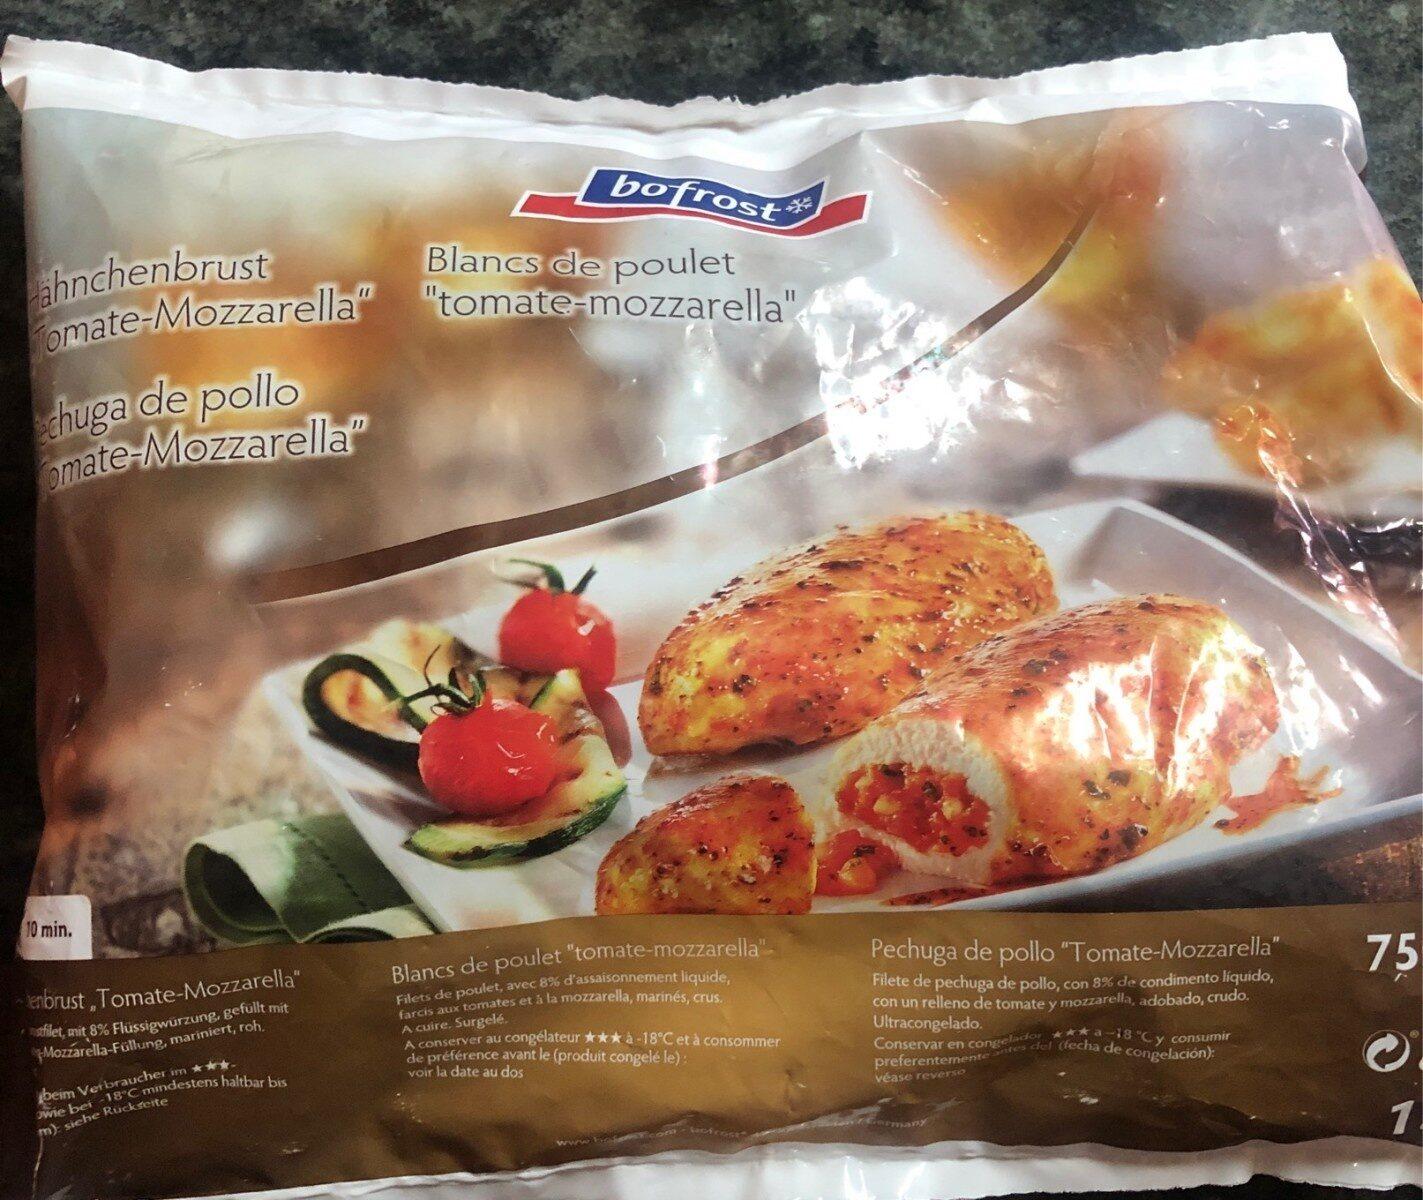 Pechugas de pollo tomate mozarella - Product